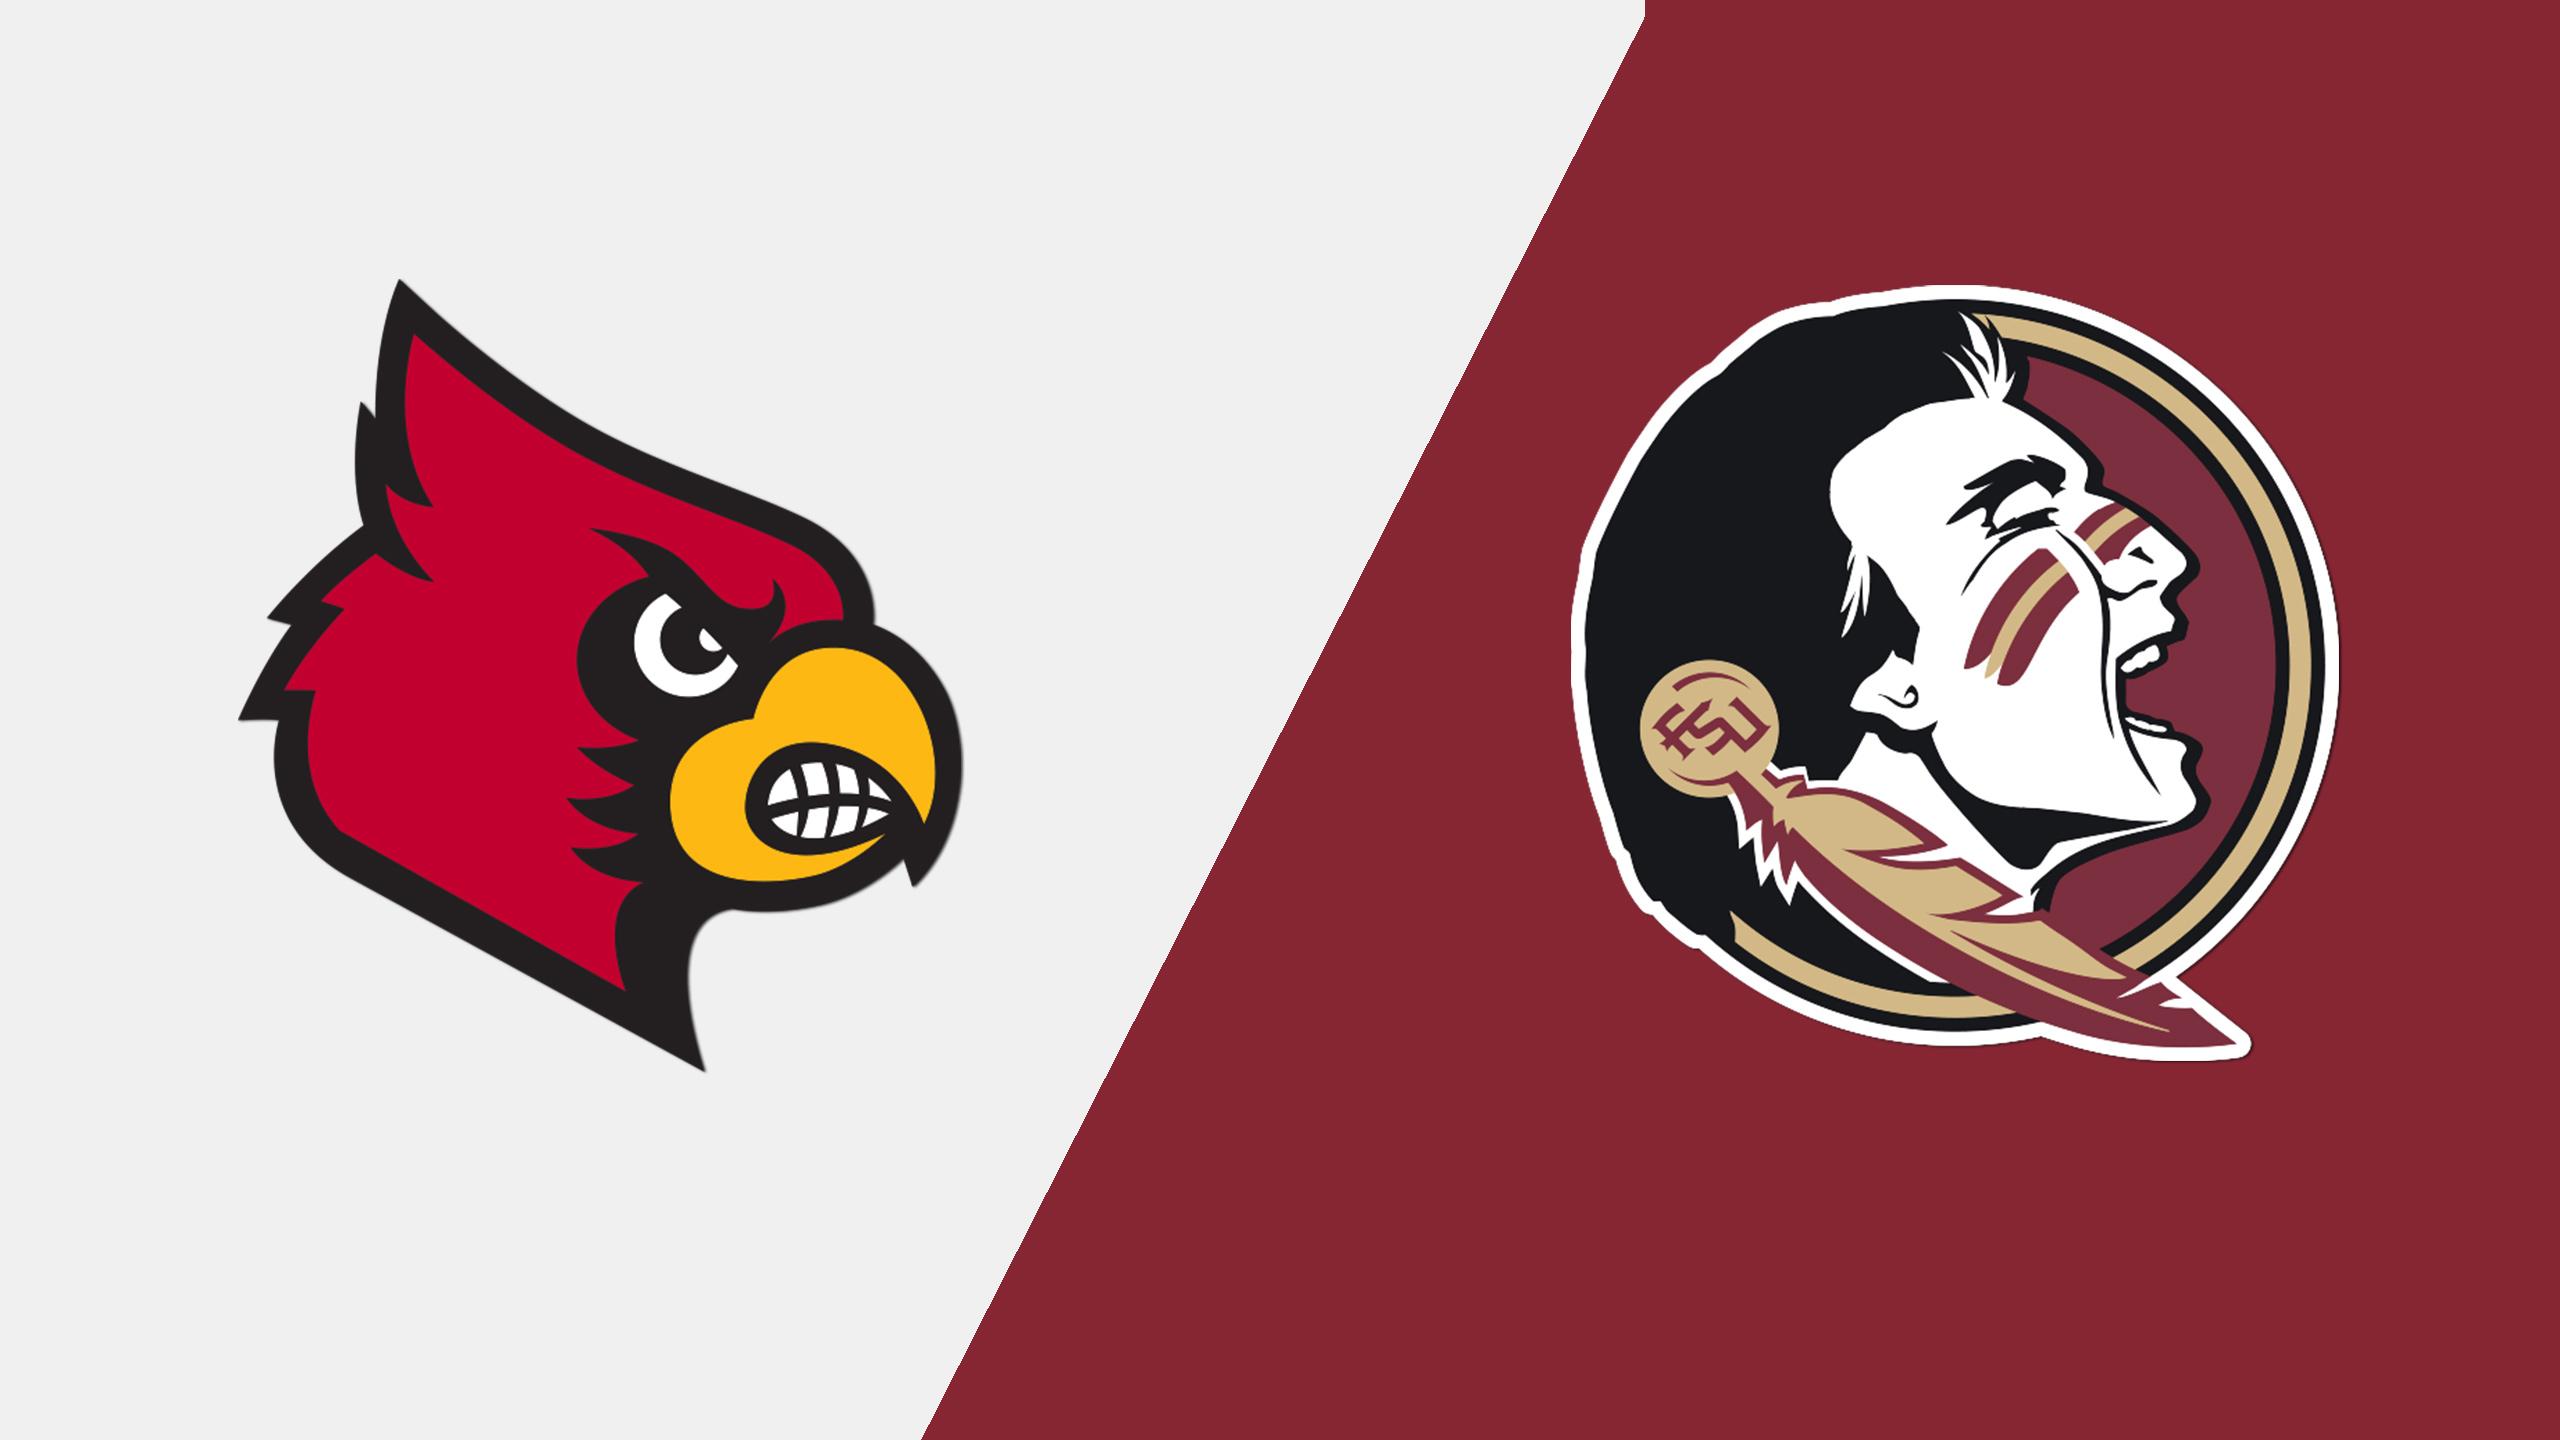 #4 Louisville vs. Florida State